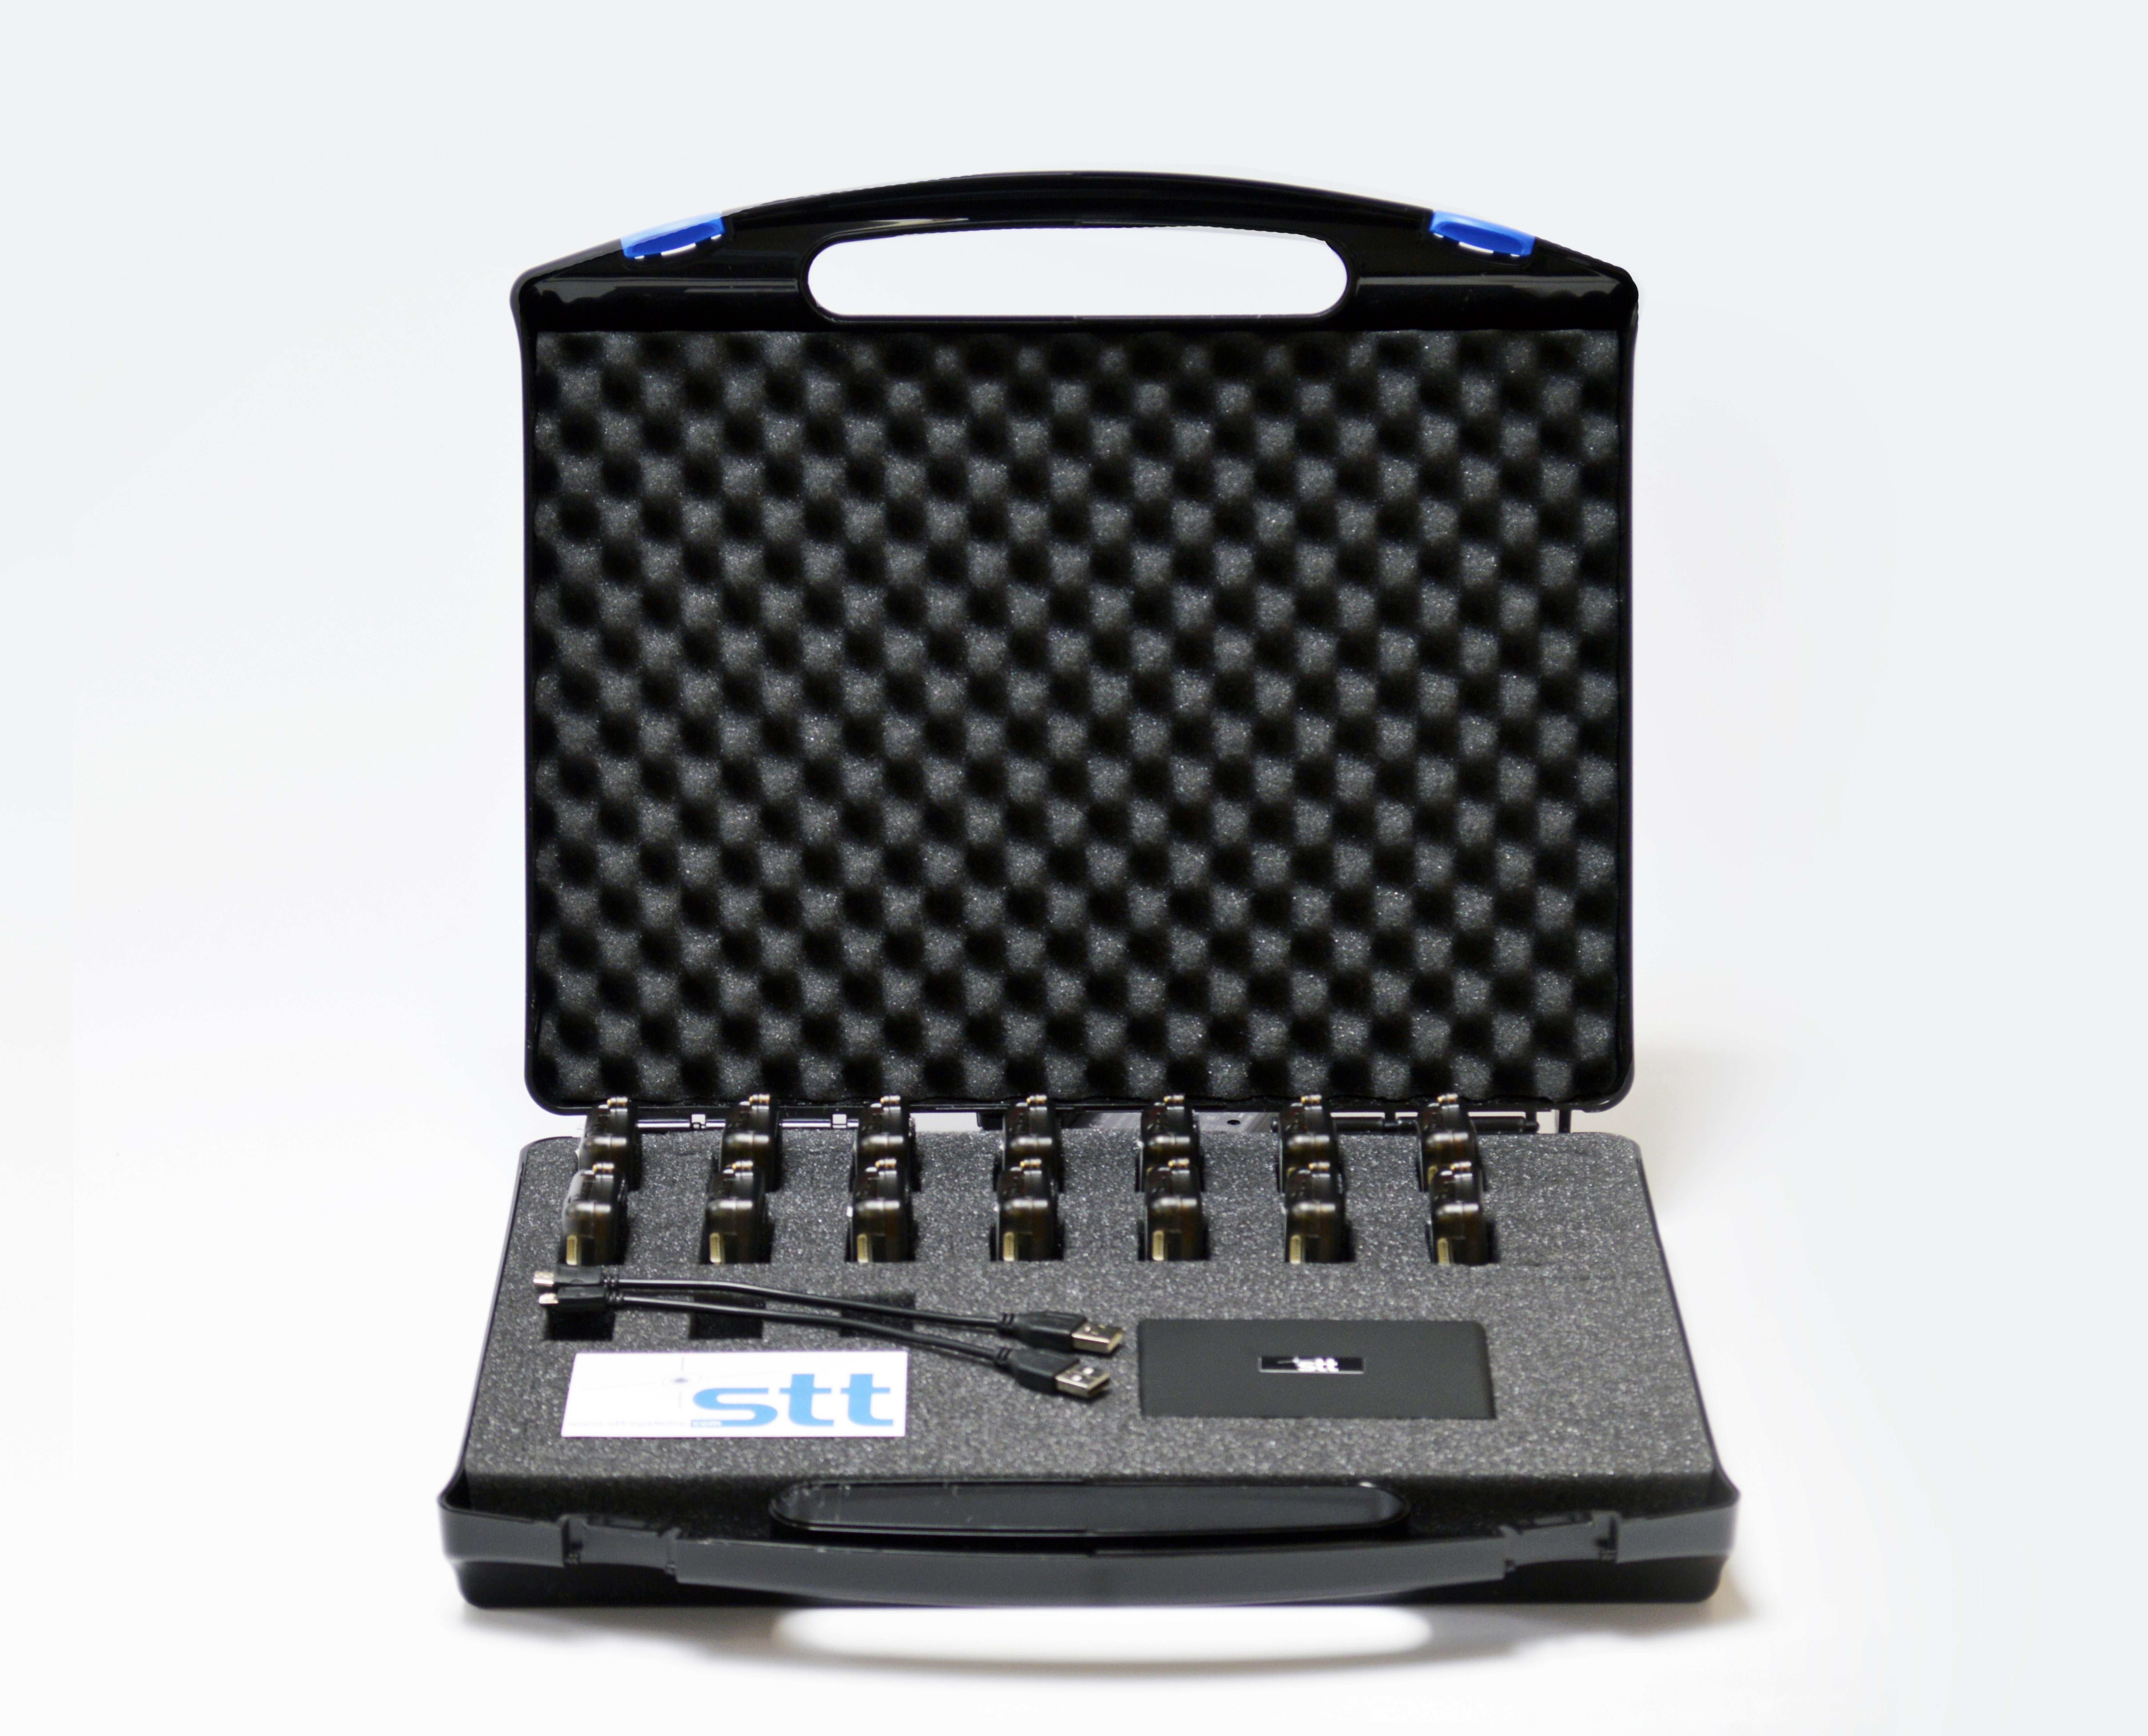 Case_STT-IWS-265750-edited.jpg